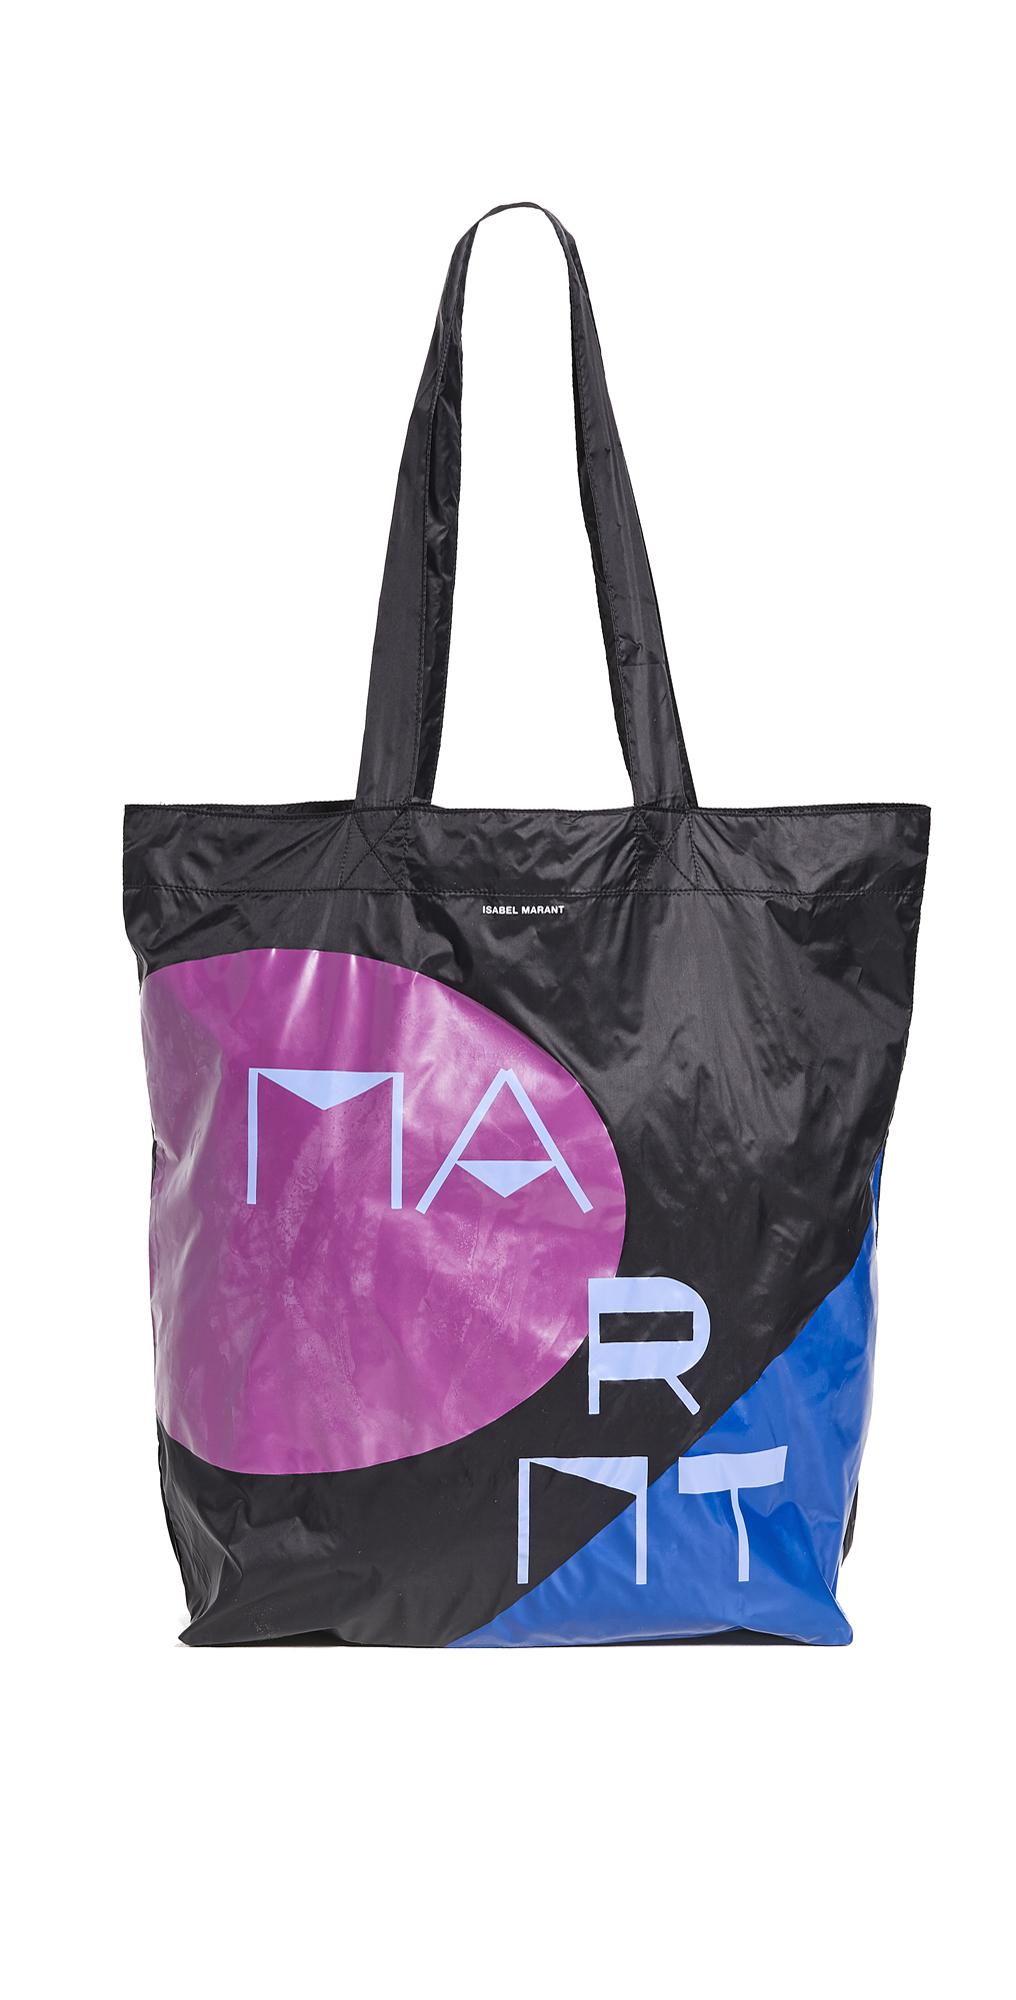 Isabel Marant Woom Bag